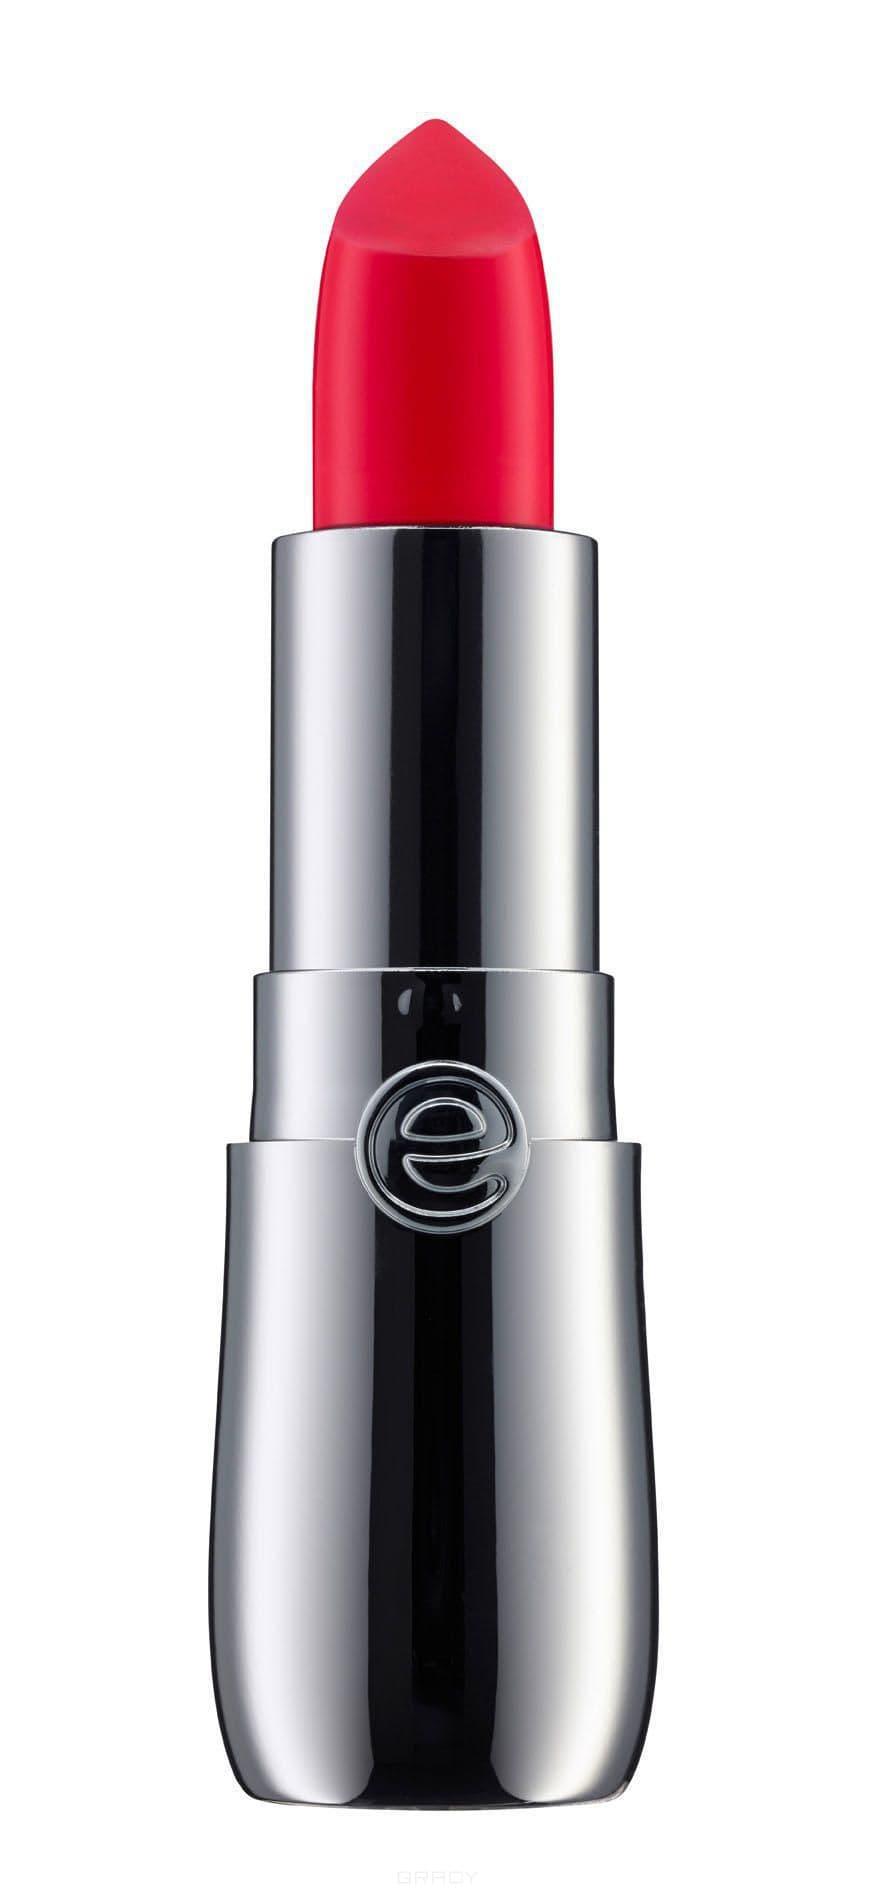 все цены на Essence, Сияющая губная помада Colour Up! Shine On! Lipstick, 3.5 гр (12 тонов) №06, ярко-красный онлайн